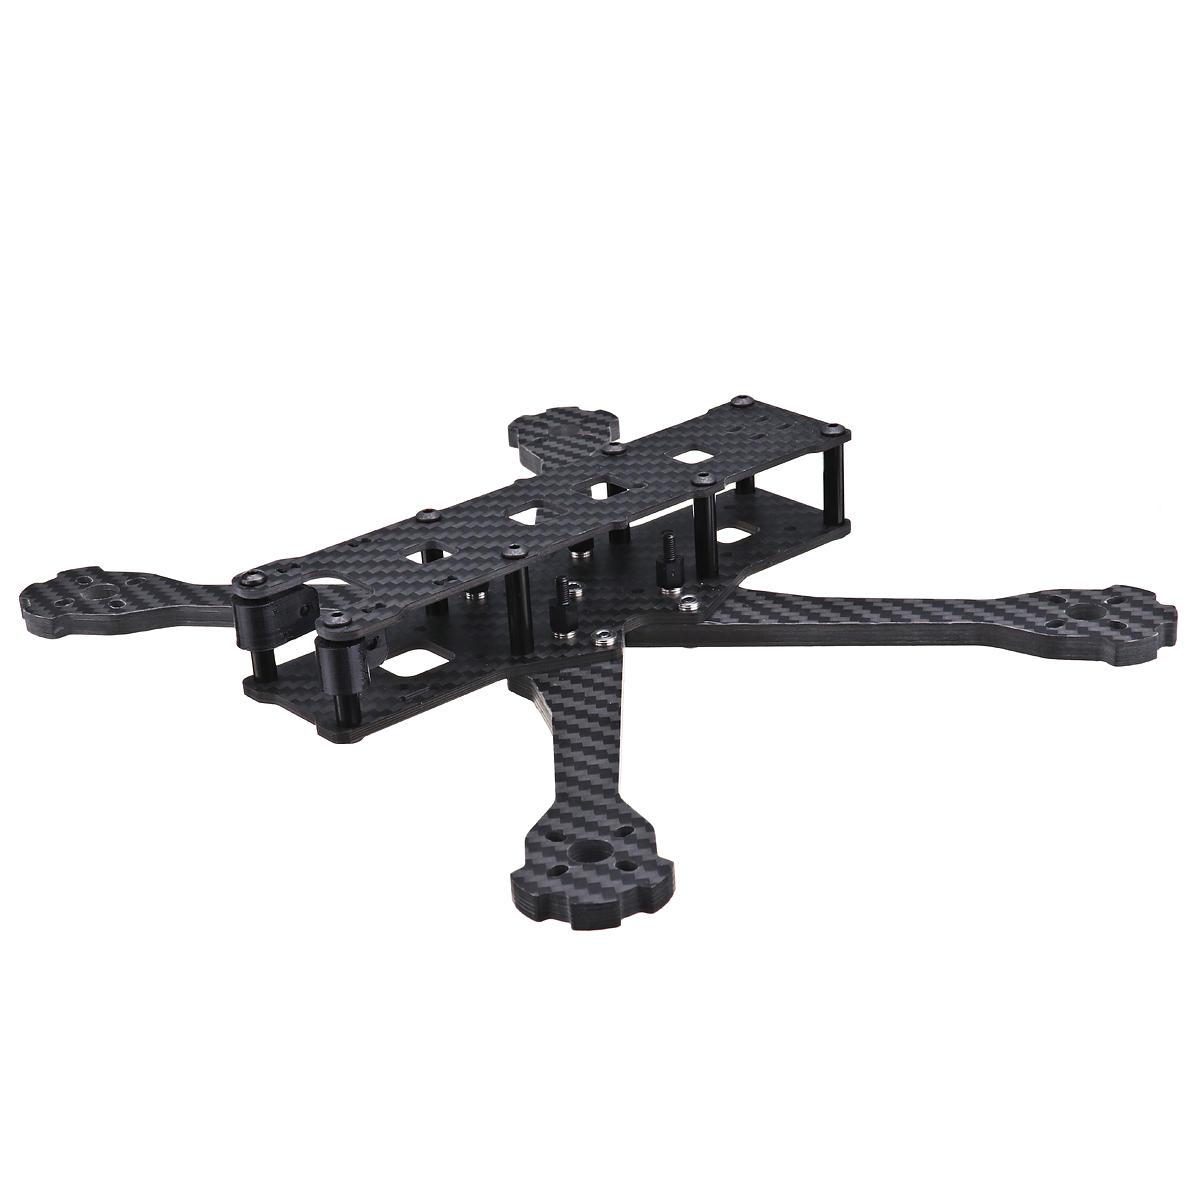 URUAV UF3 5/6/7 Inch 220/250/300mm Carbon Fiber FPV Racing Frame Kit 5.5mm Arm for RC Drone